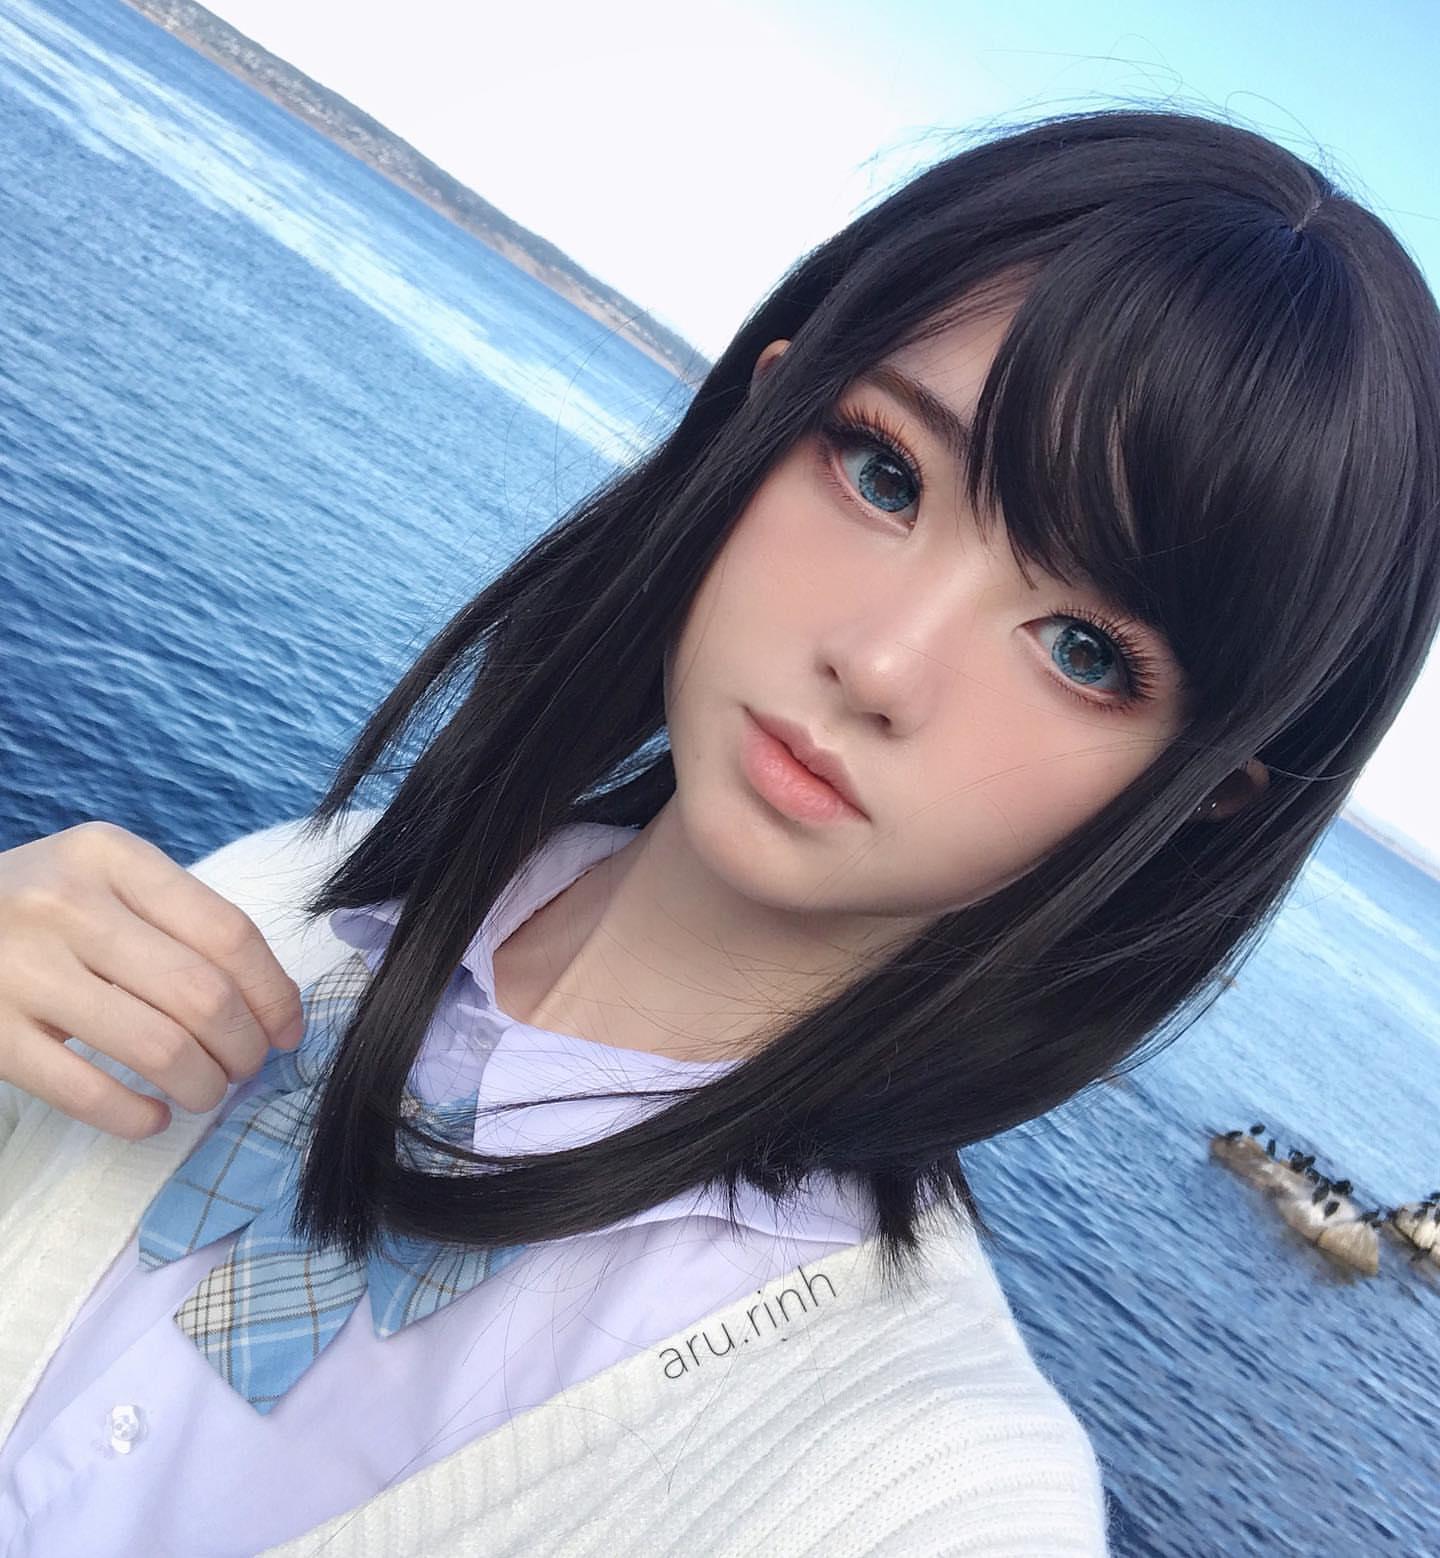 Zekia 遙凛 aru.rinh